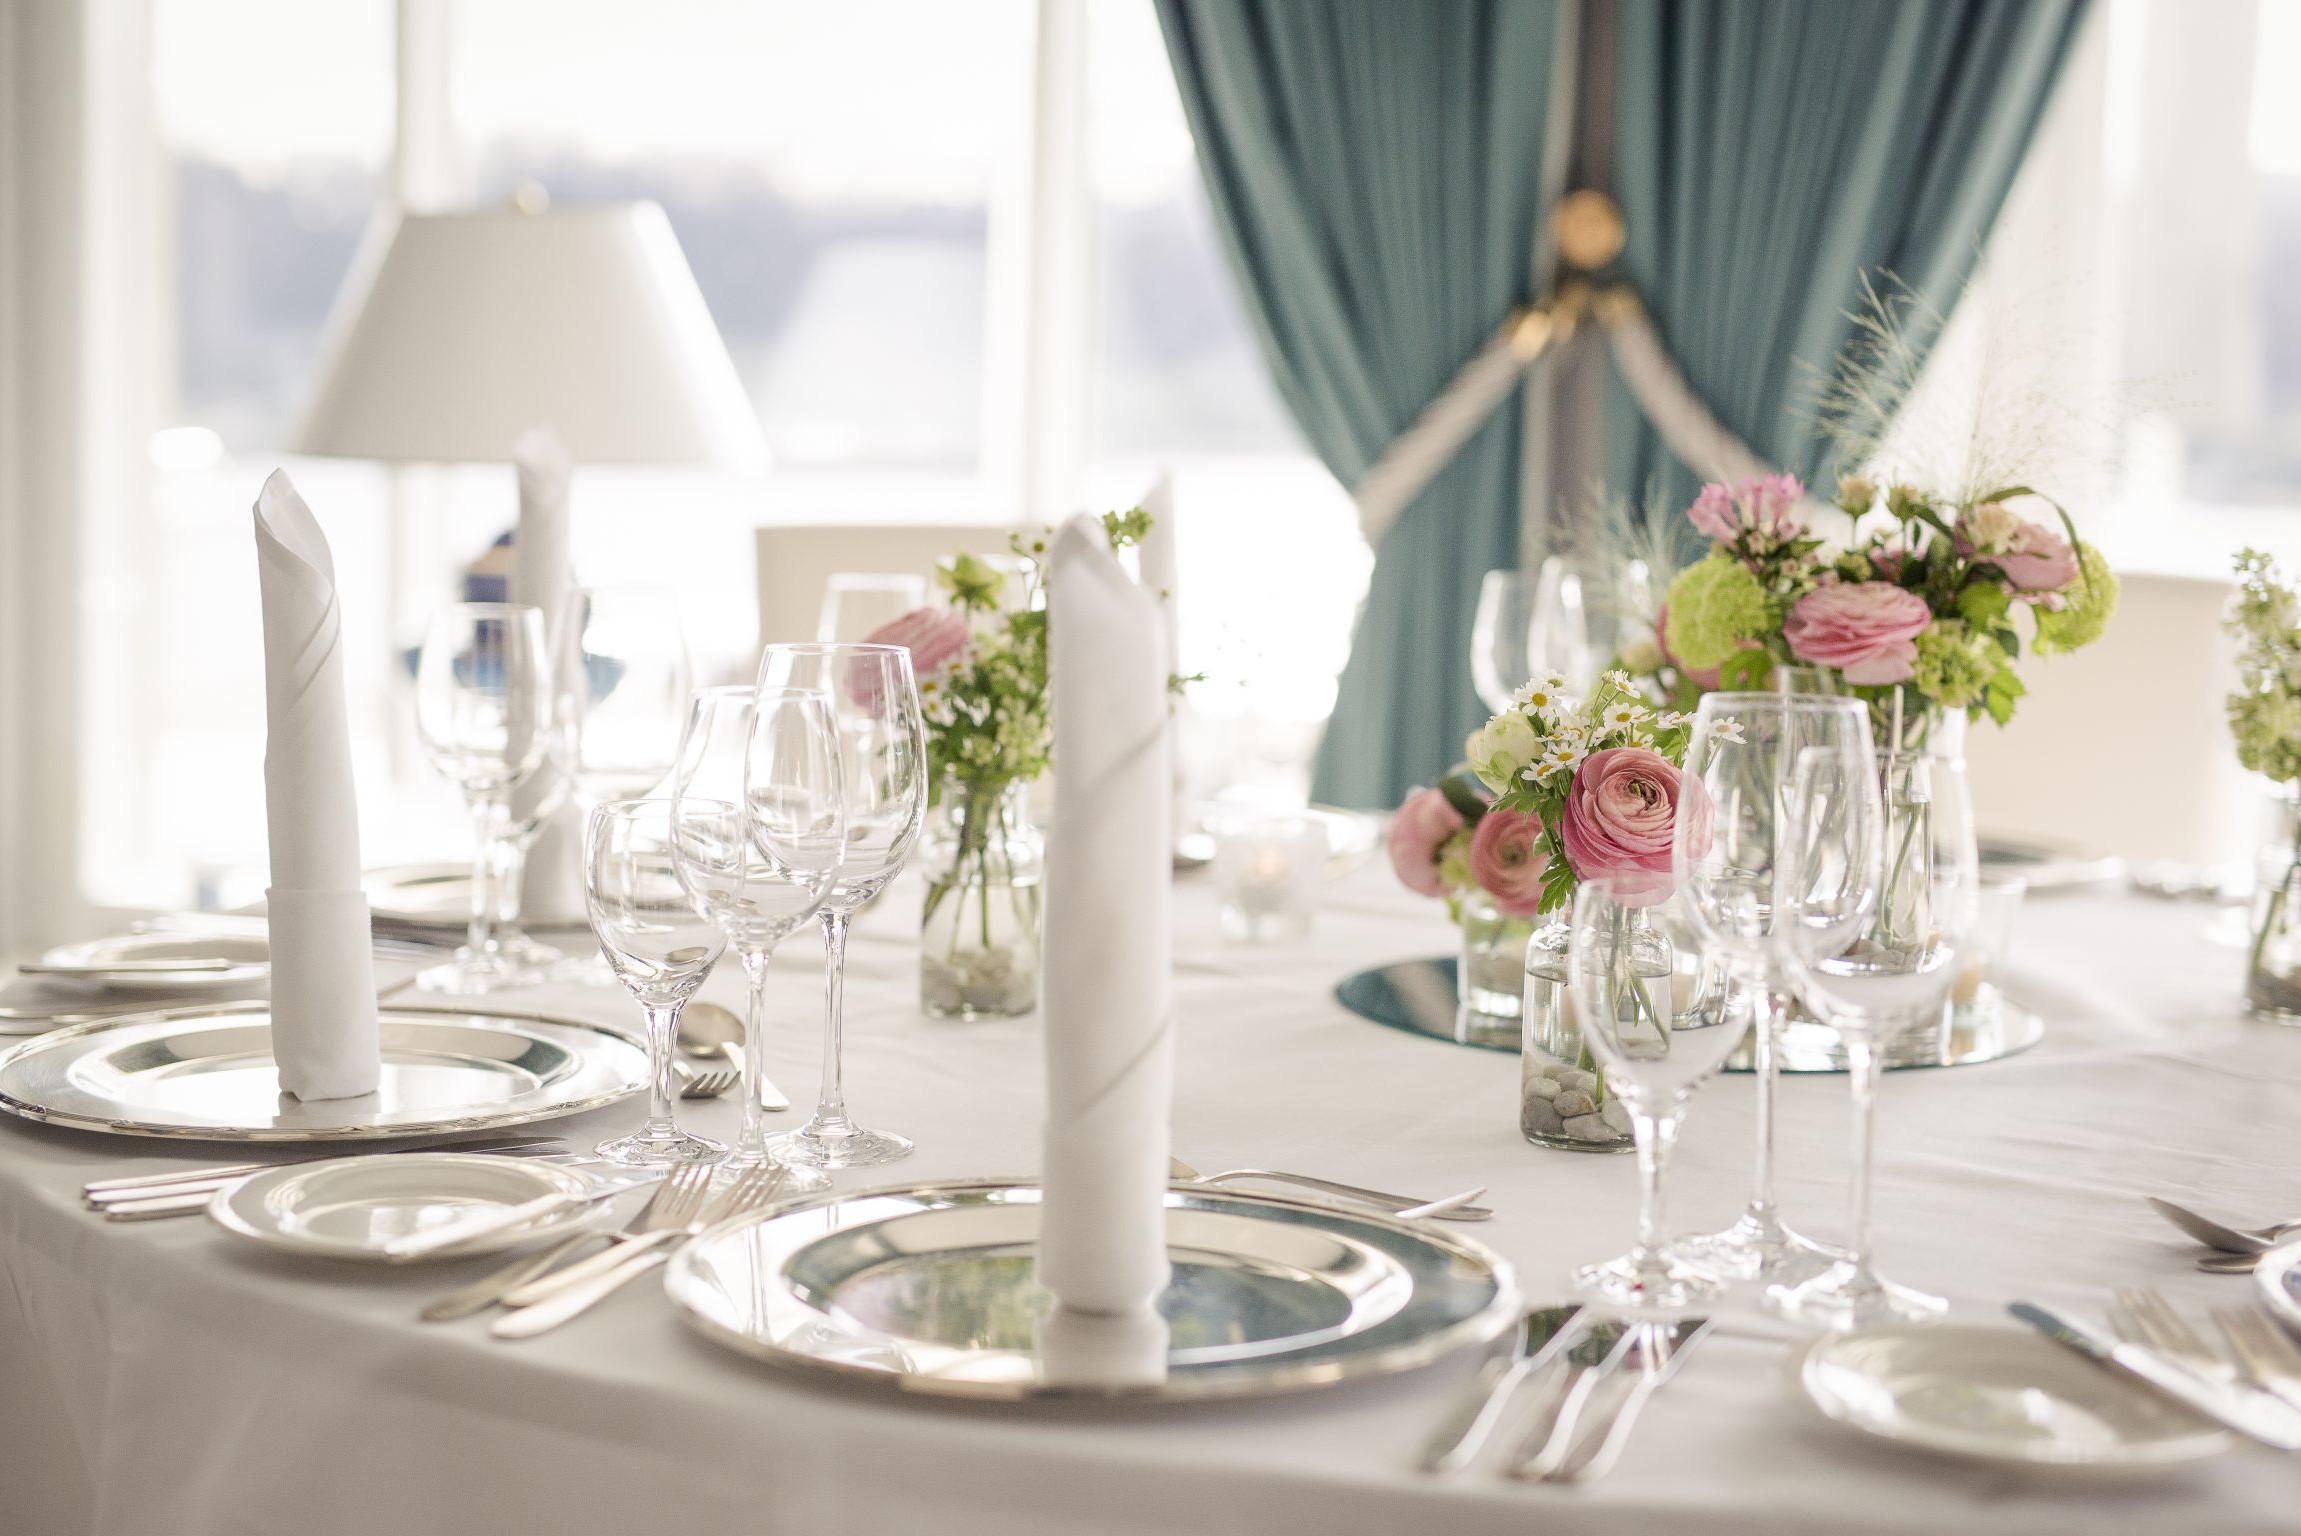 Dorint Park Hotel Bremen Hochzeit De